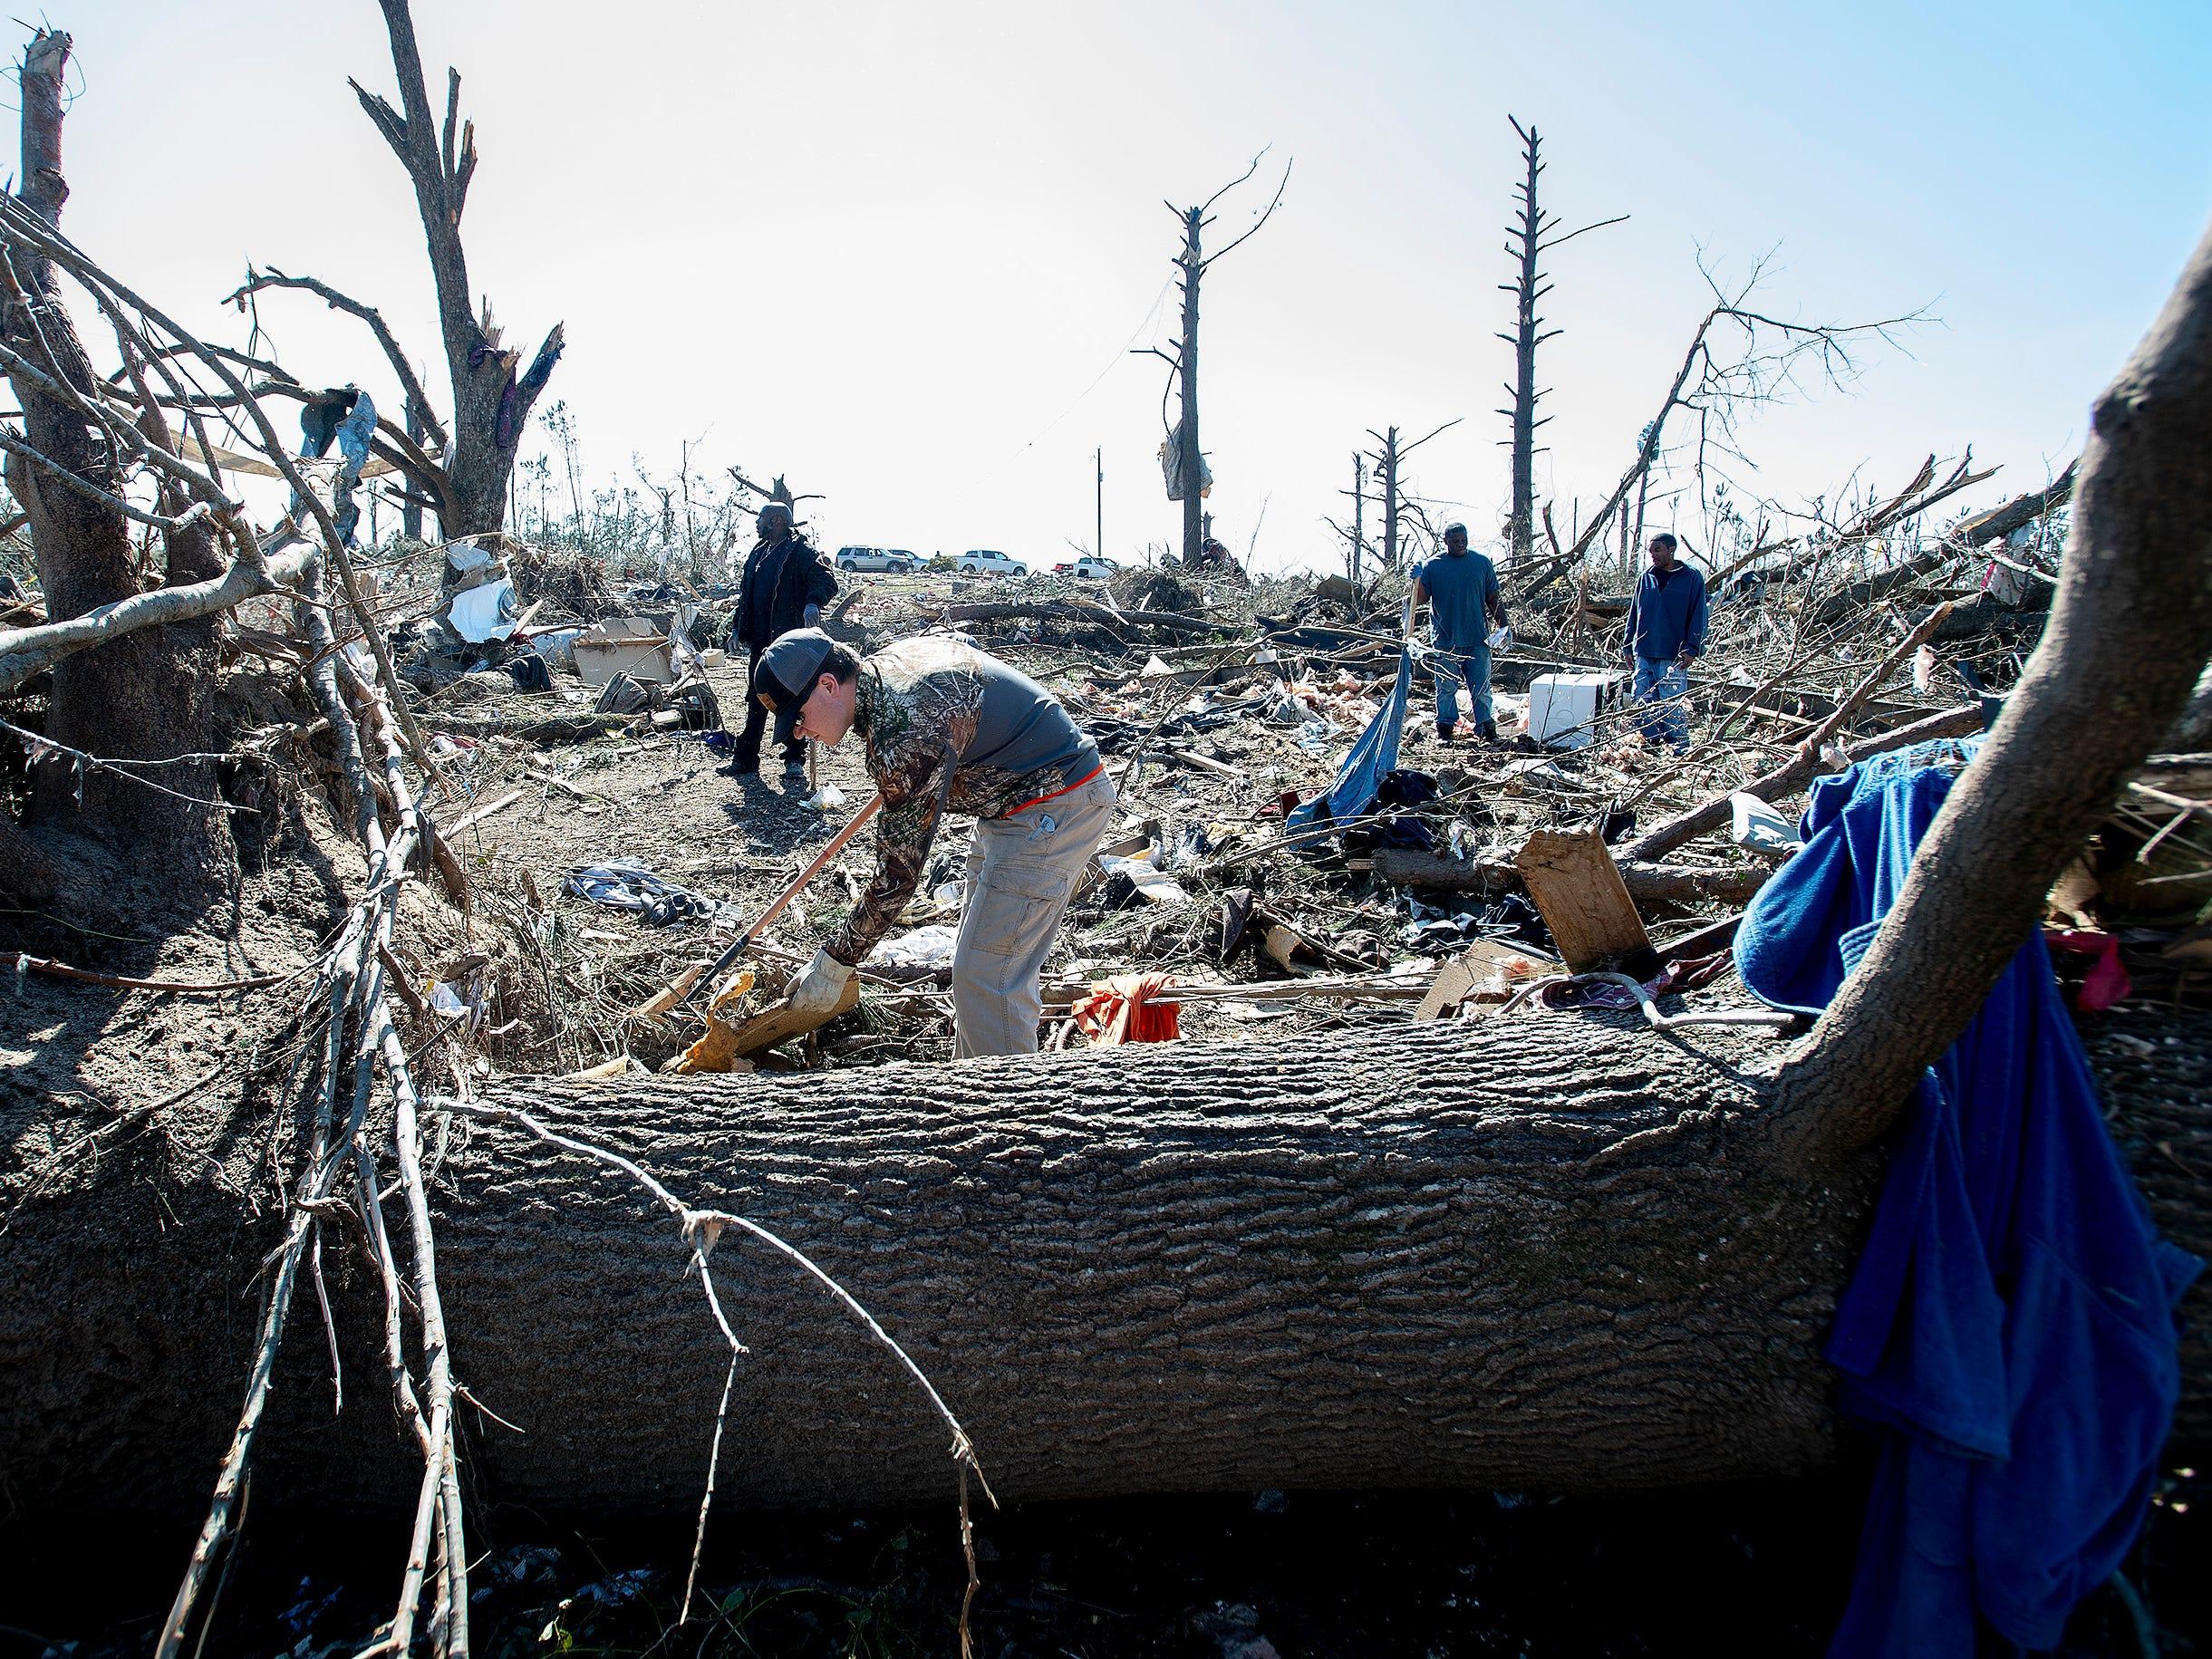 Volunteers look for valuables among the debris in Beauregard, Ala., on March 7, 2019.